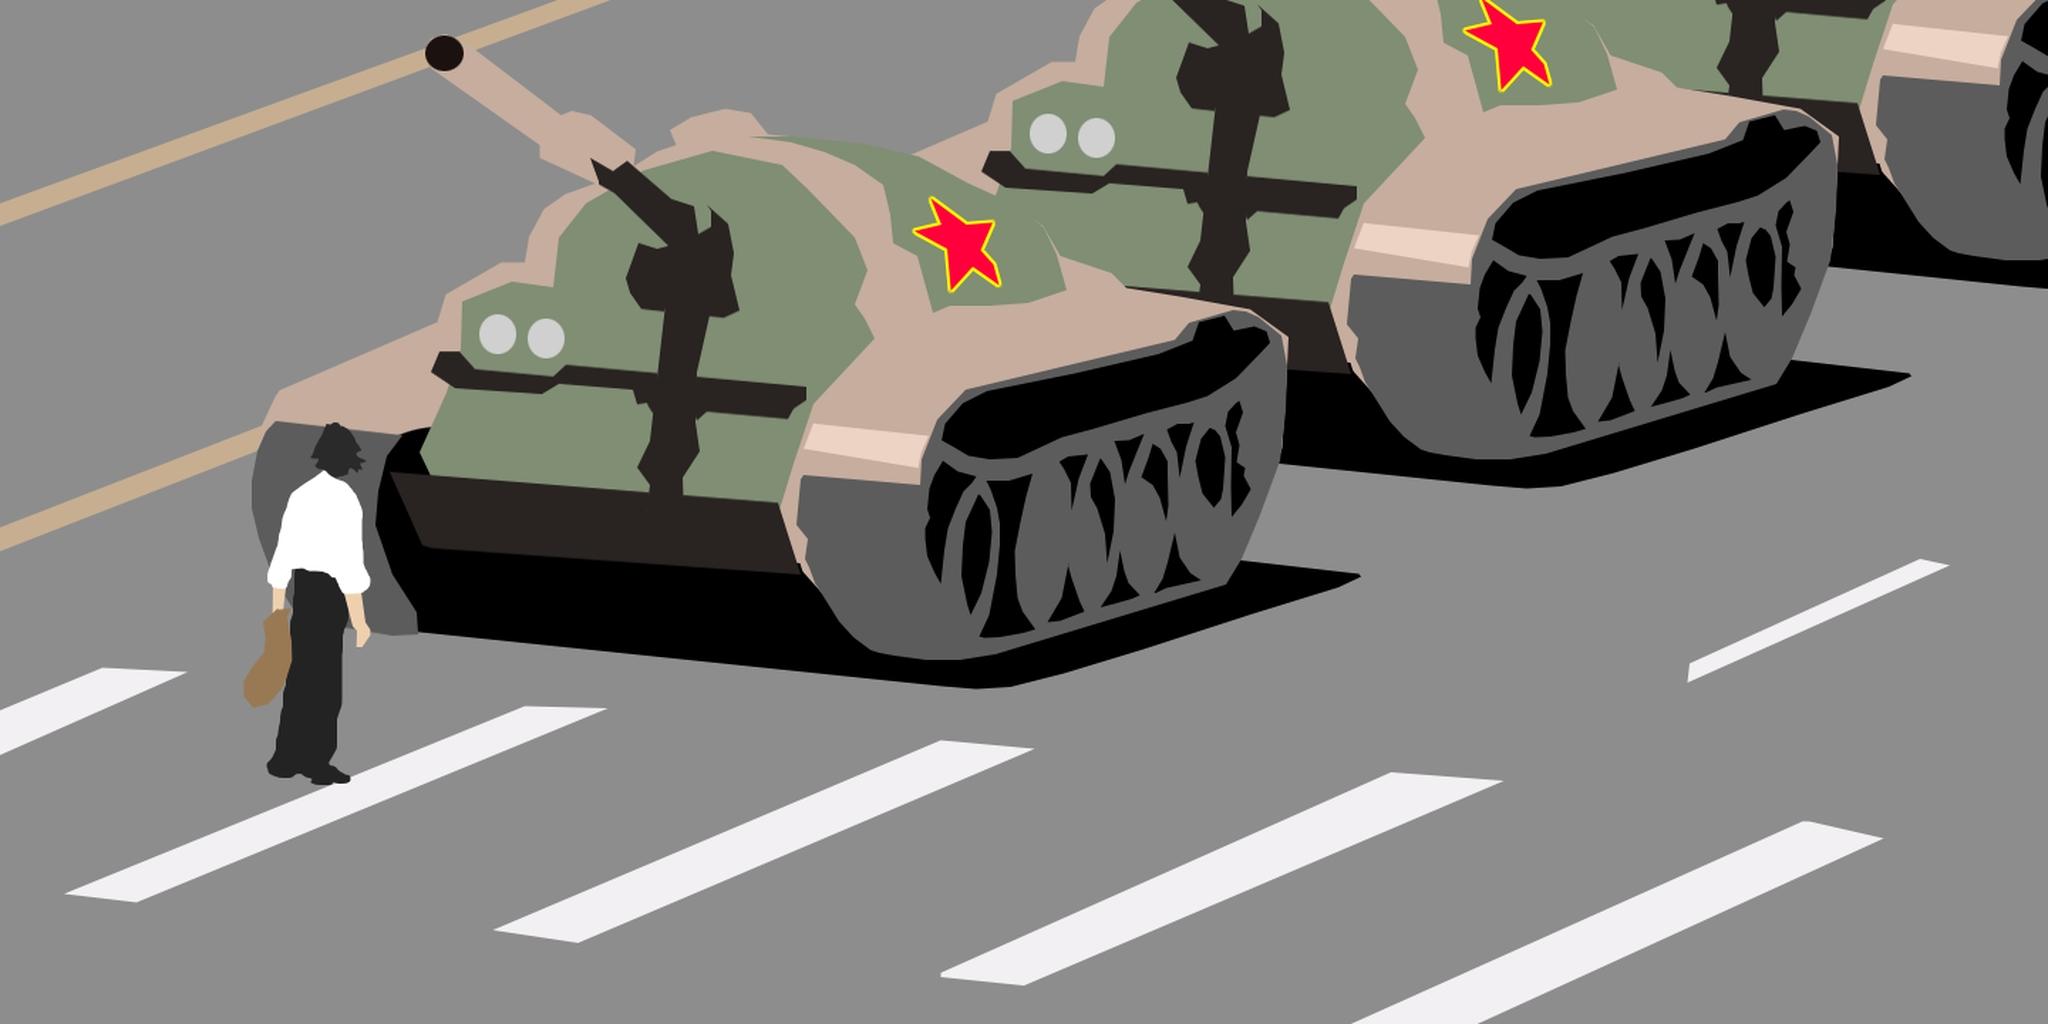 China Tiananmen Square Incident 2013